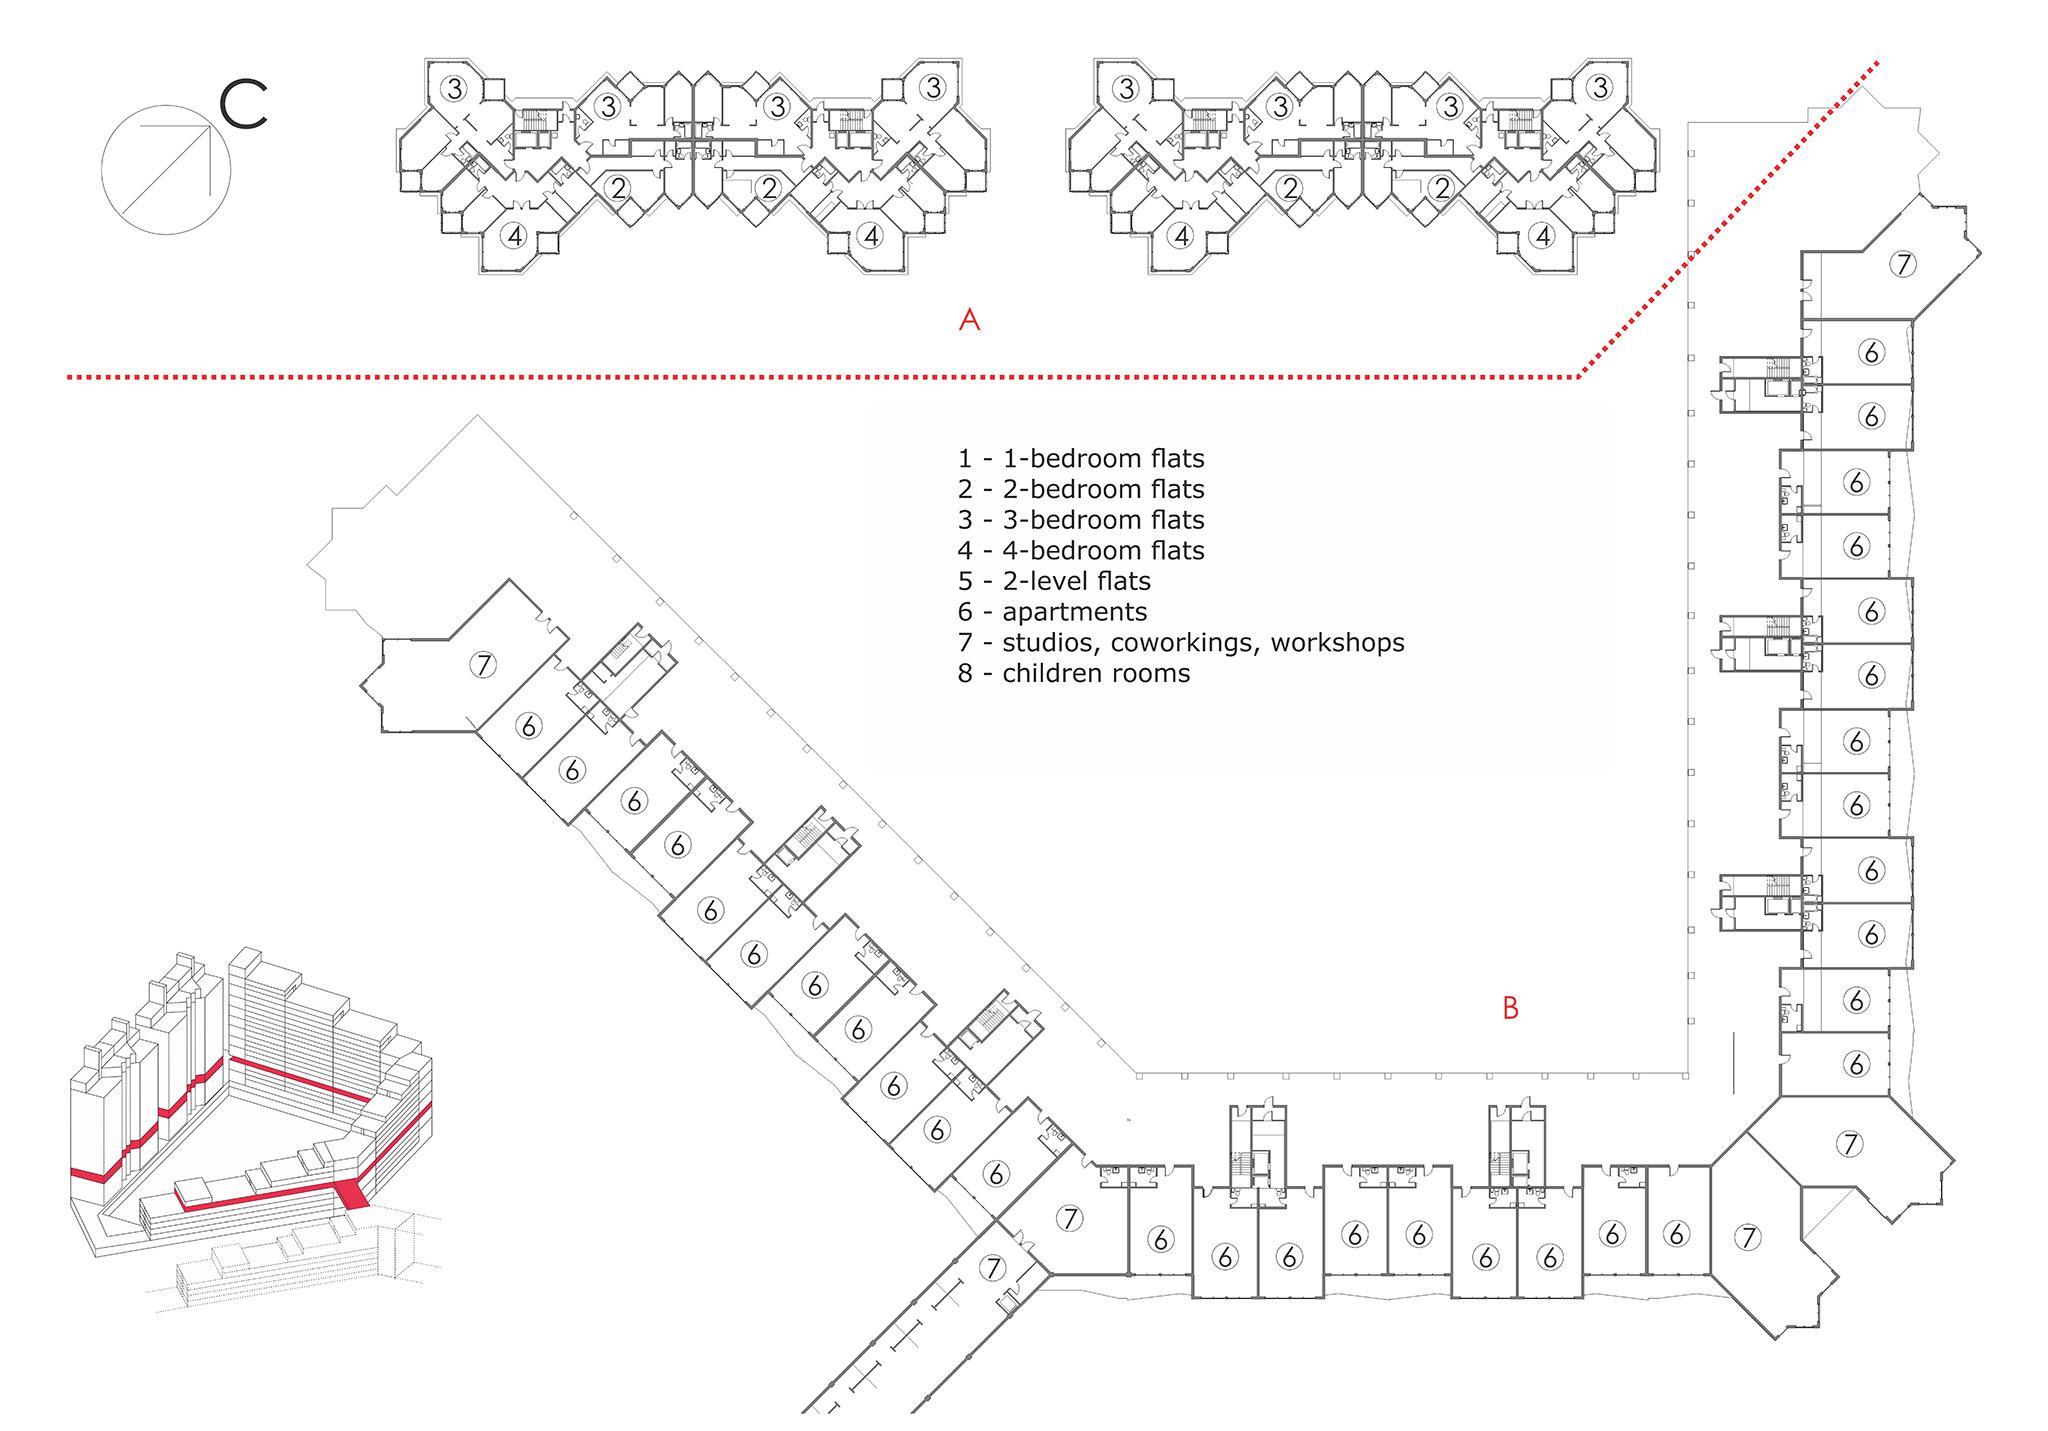 жилой комплекс архитектура проект